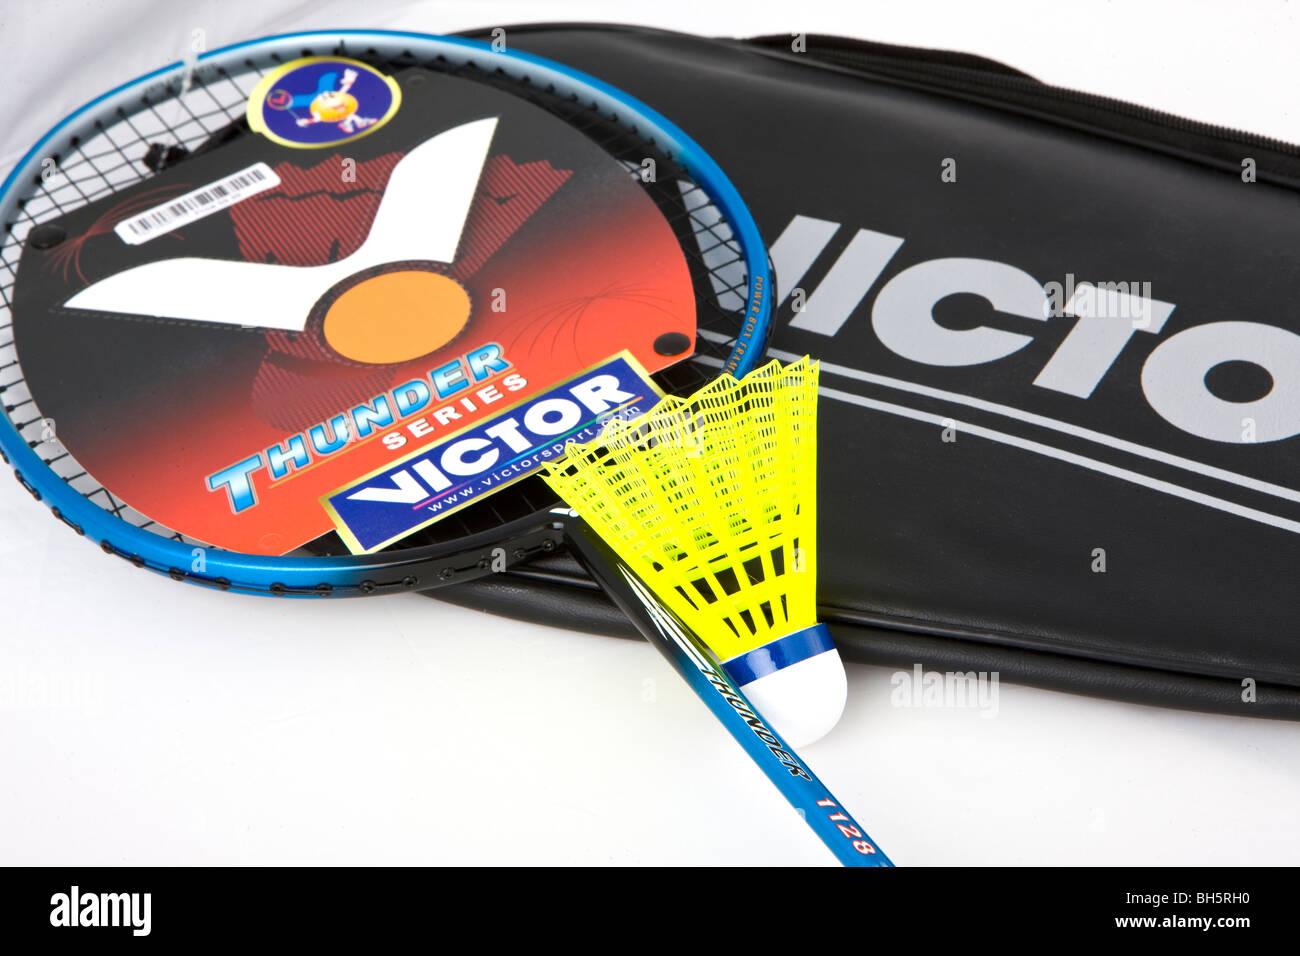 Badminton racket and shuttlecock brand new - Stock Image